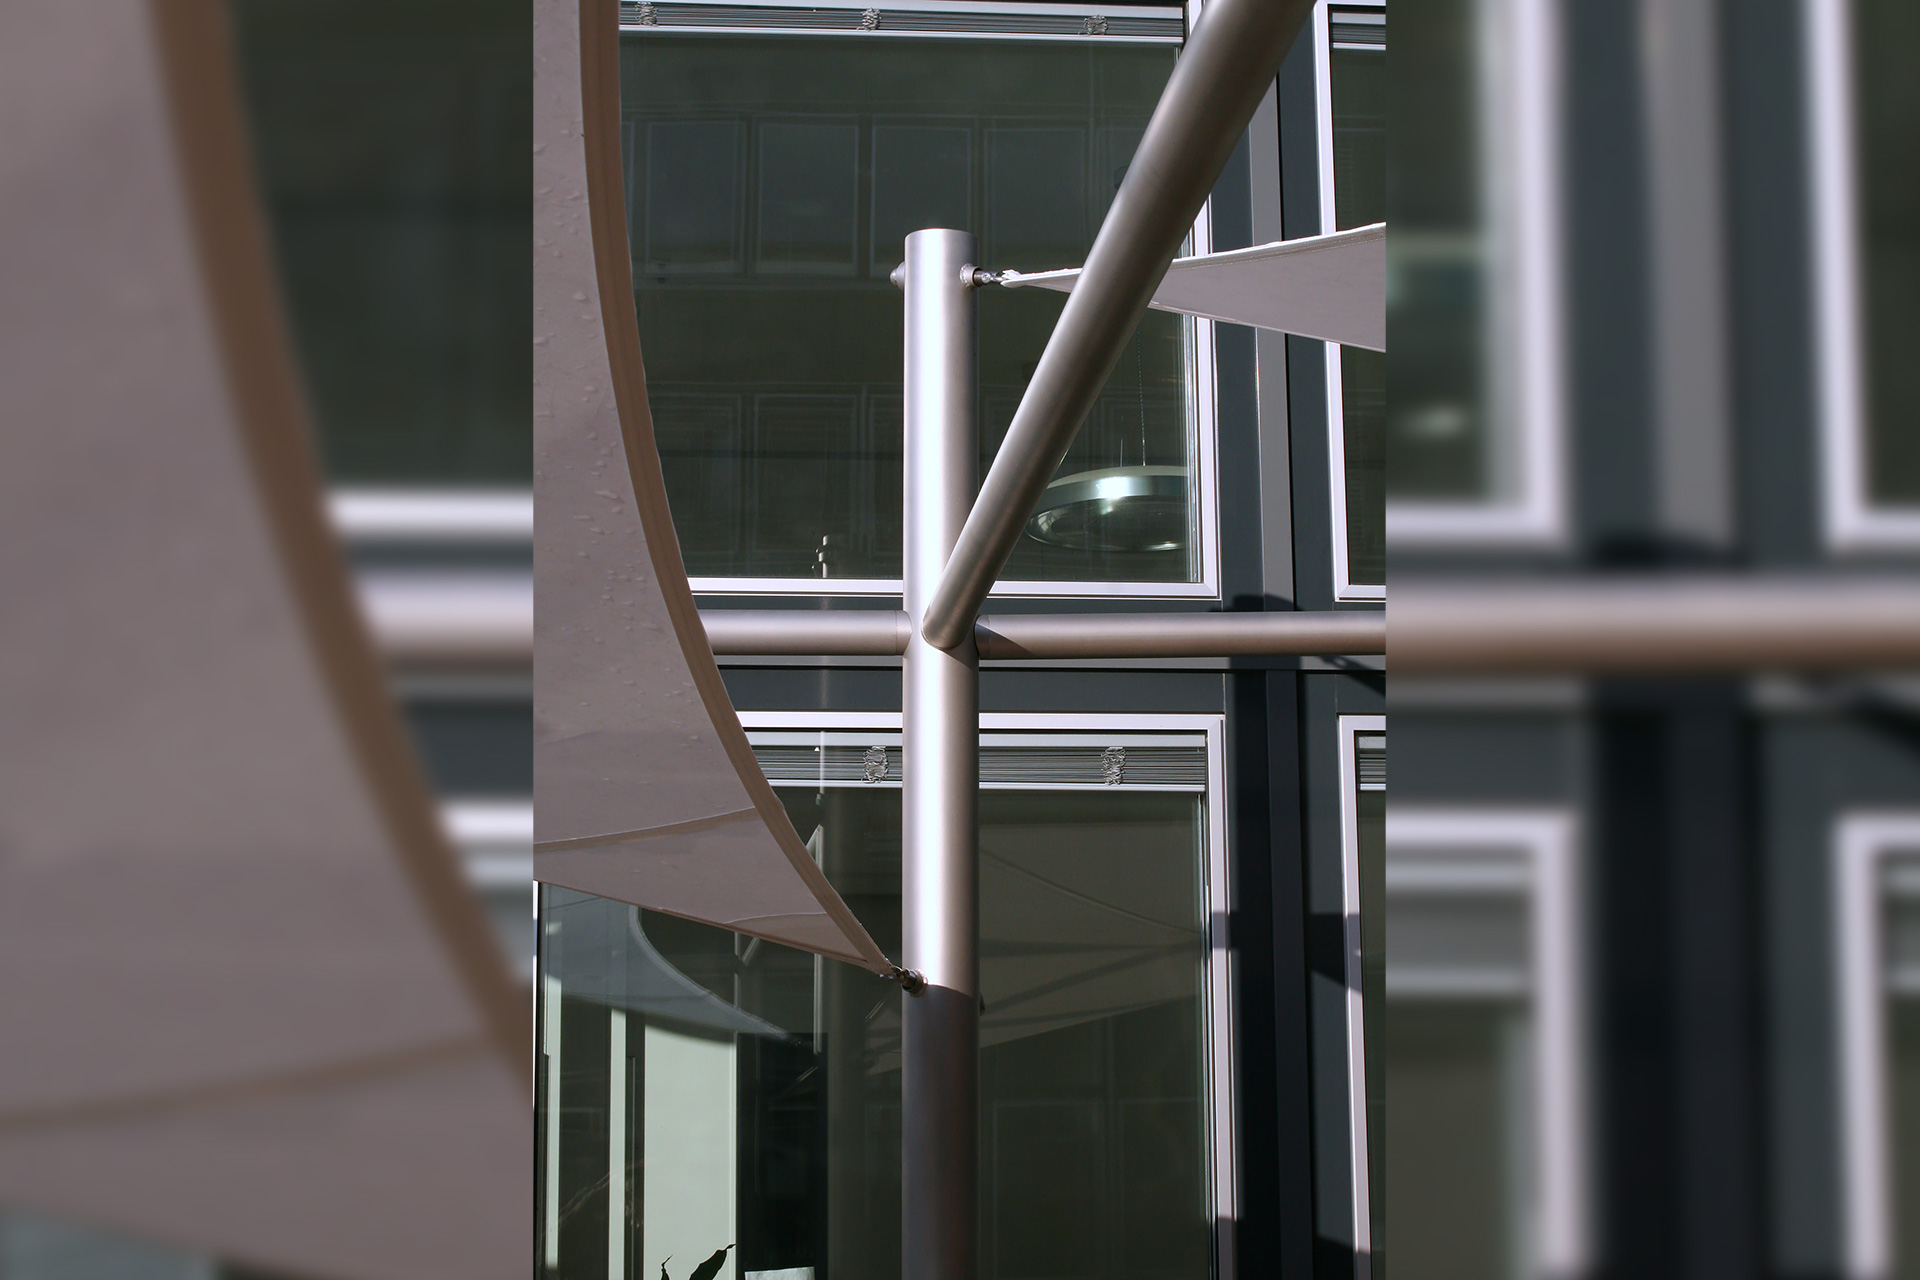 poeschl_anlagenbau_Sonderbauteile_aeronautec-aerosun